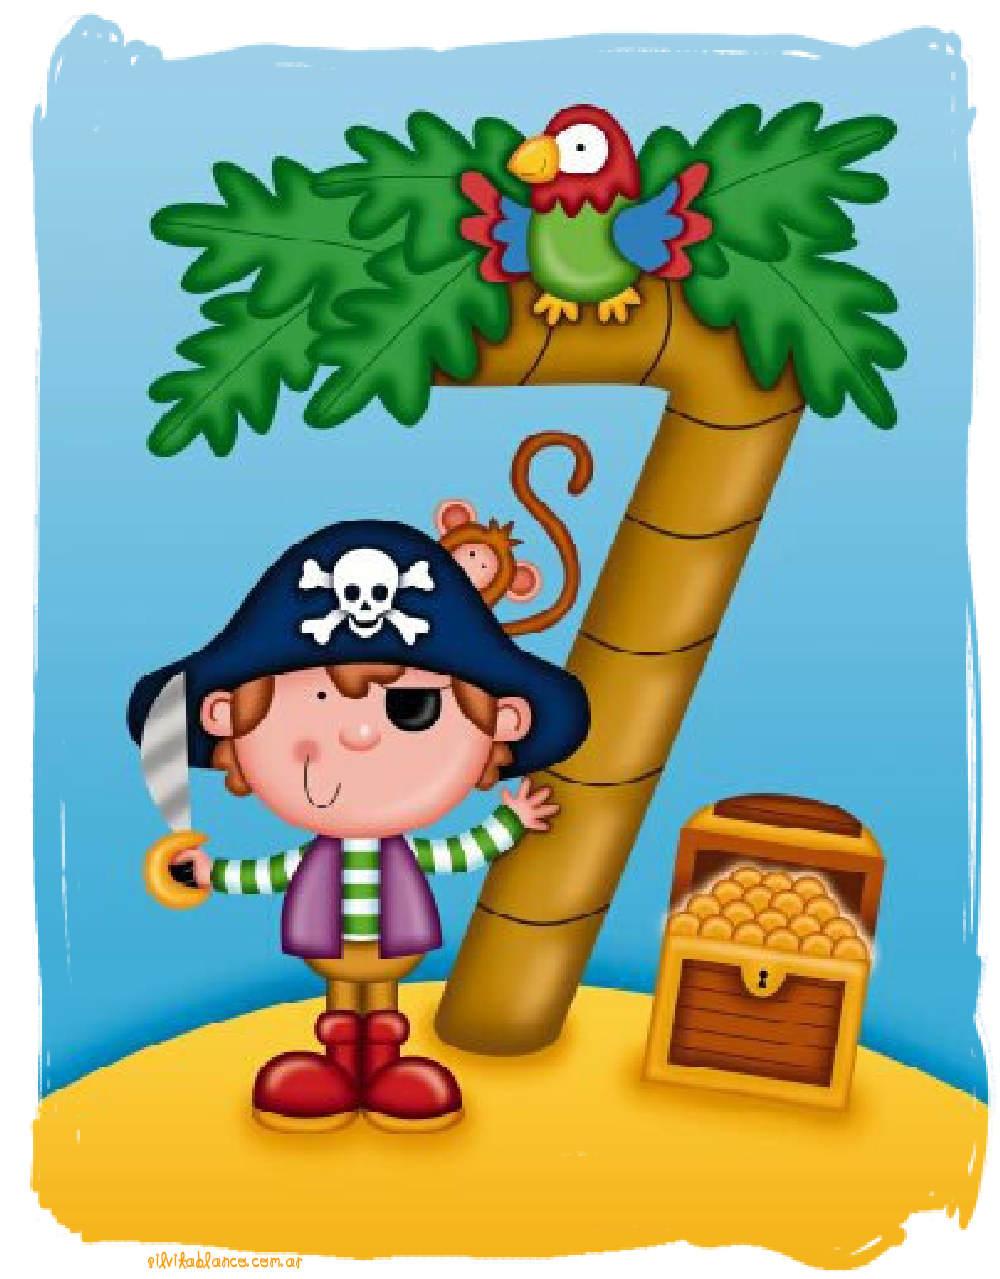 My little house silvita blanco - Imagenes de piratas infantiles ...